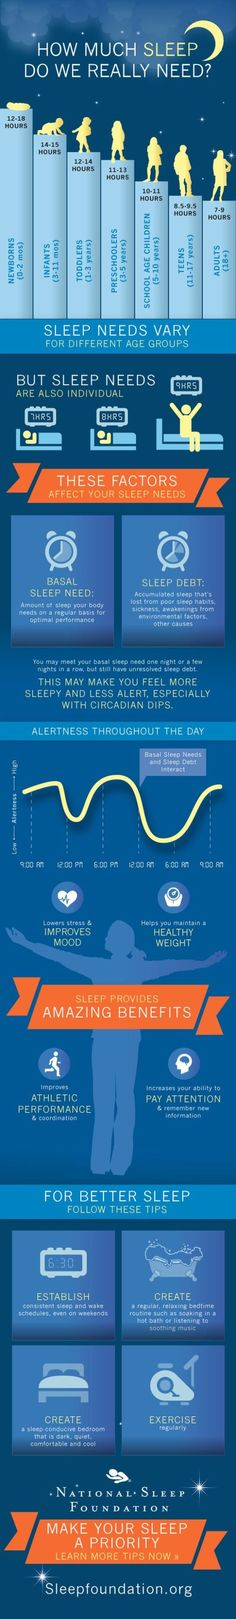 How Much Sleep Do You Really Need Per Night